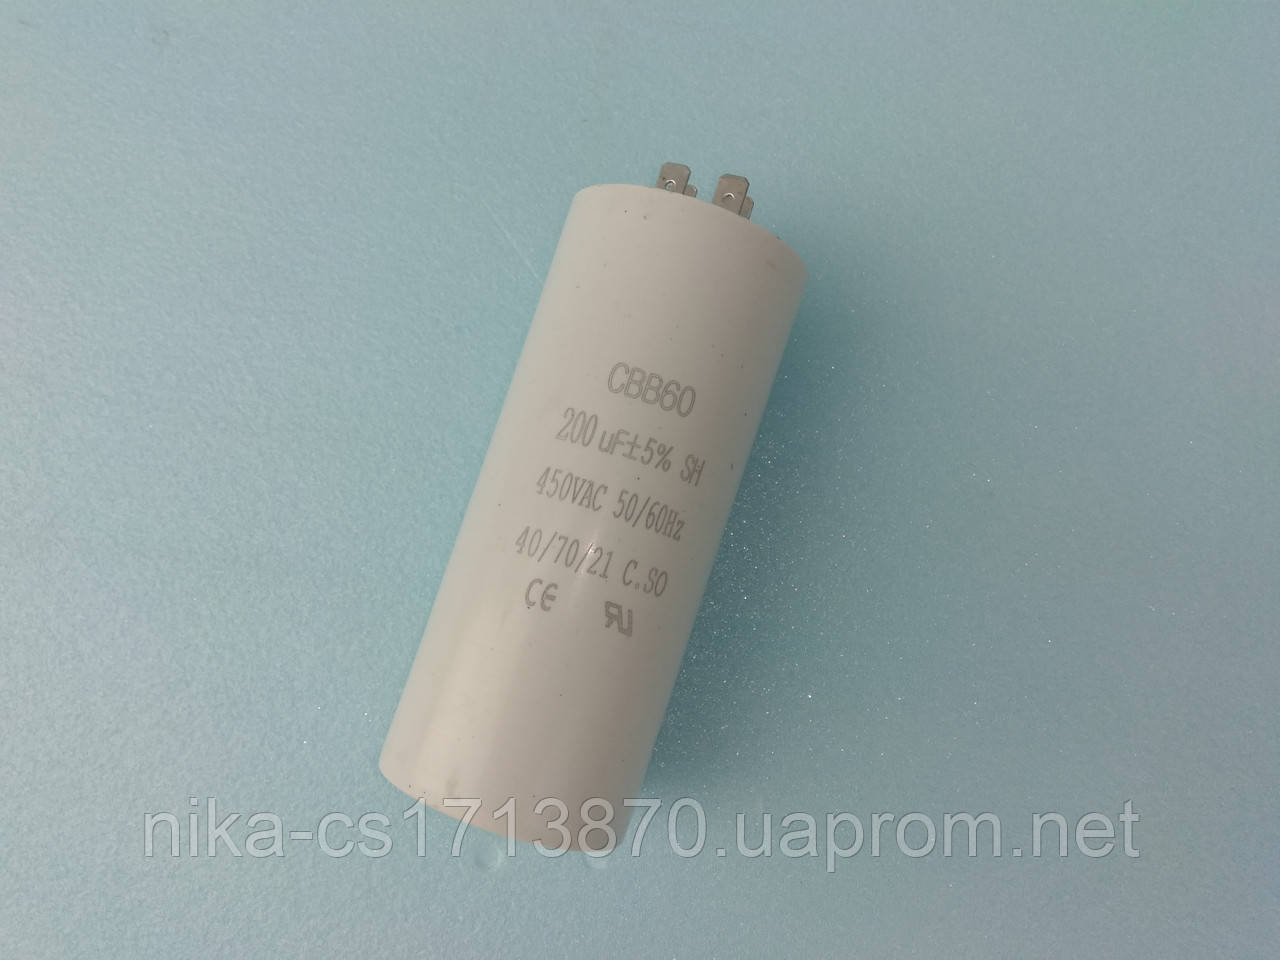 Конденсатор рабочий CBB60 / 200 мкФ±5% / 450 В. / 50/60 Hz / 120х60 мм.